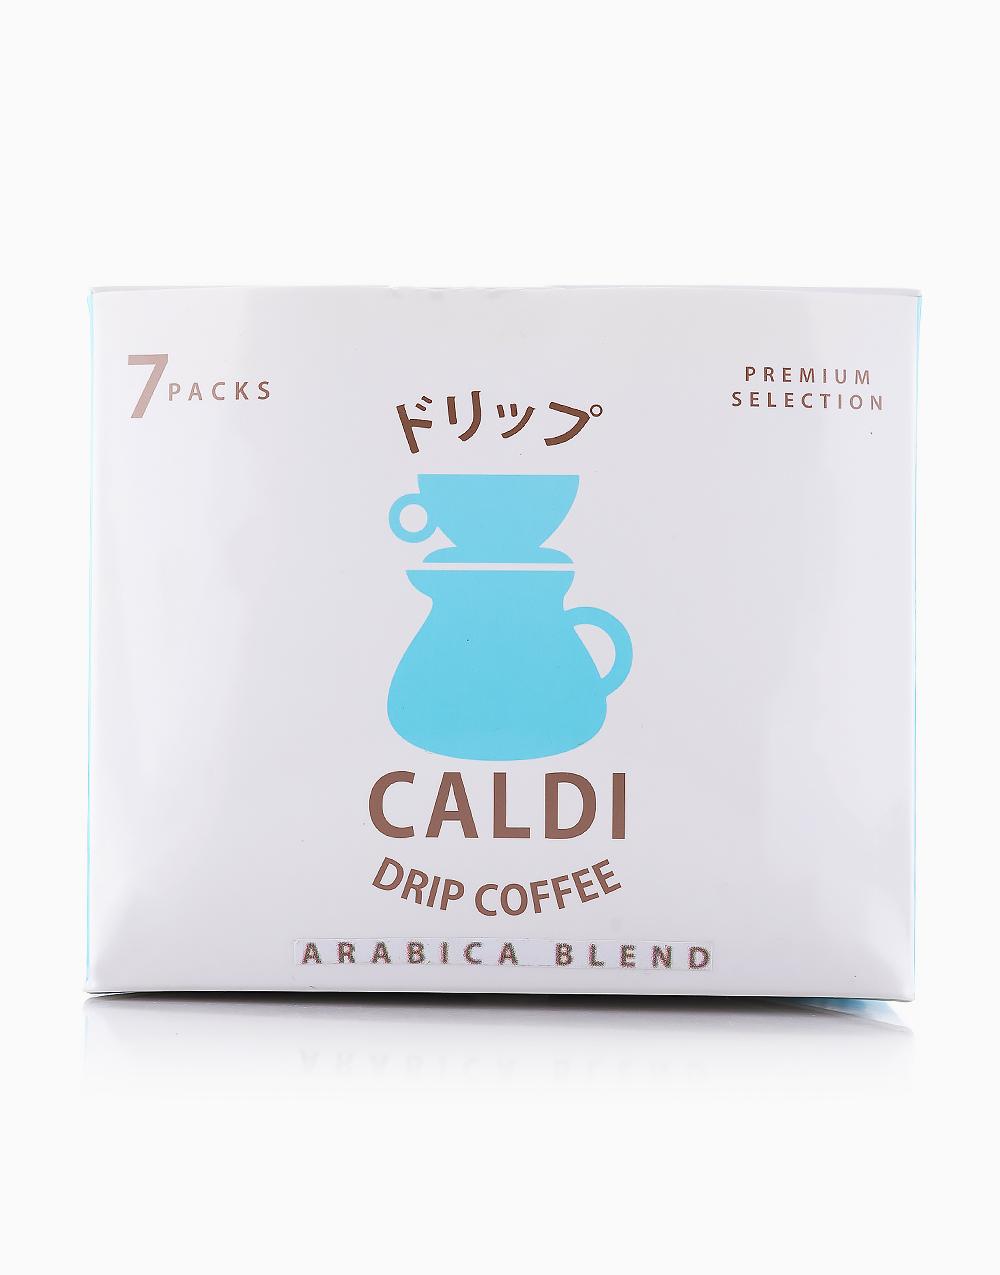 Drip Coffee Arabica Blend Box (7 Packs) by Caldi